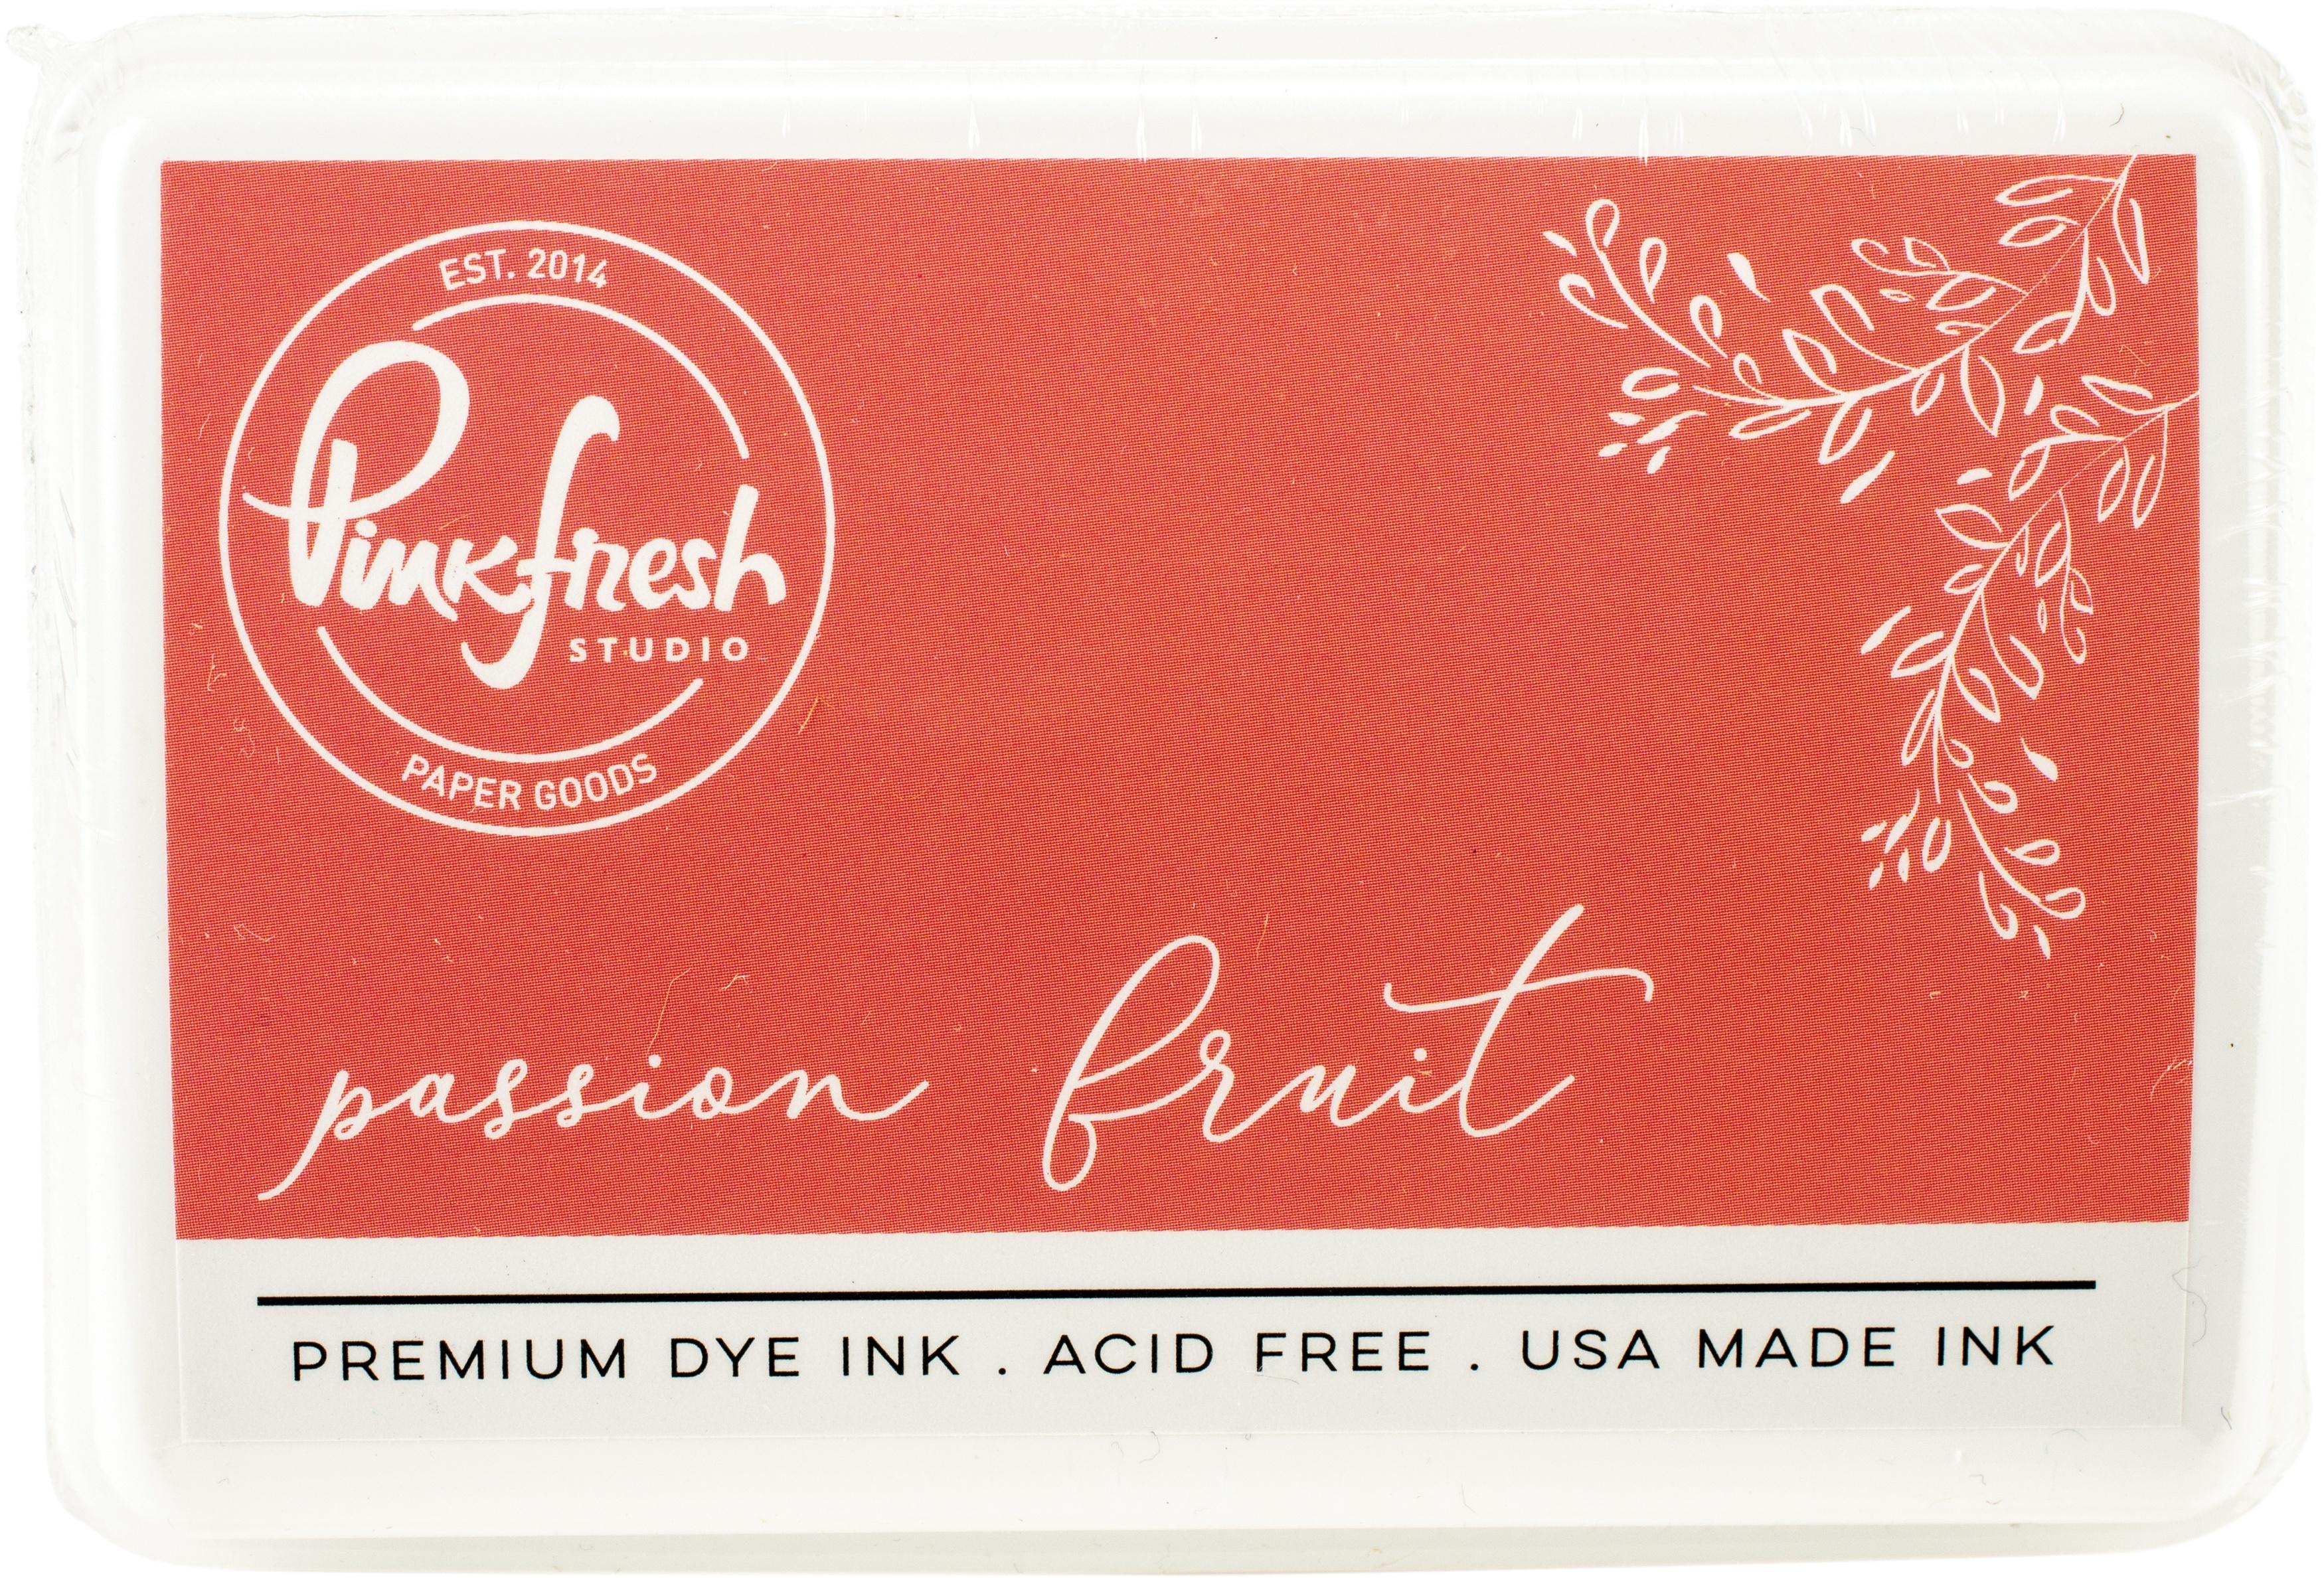 PinkFresh - Premium Dye Ink Pad - Passion Fruit